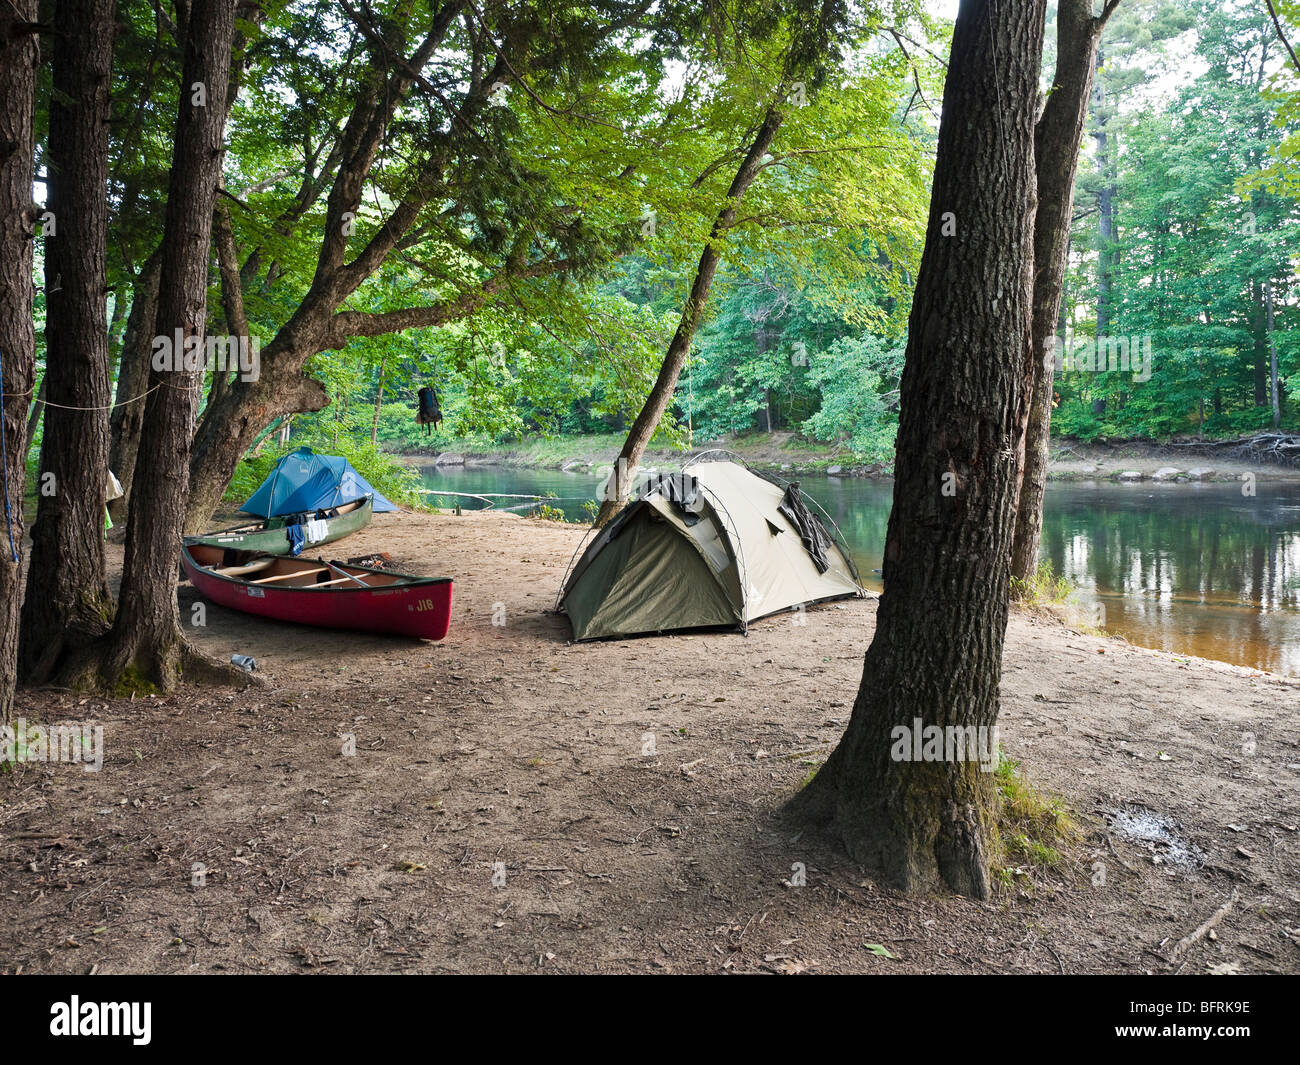 Campsite on the banks of the Saco River near Fryeburg Maine ME USA